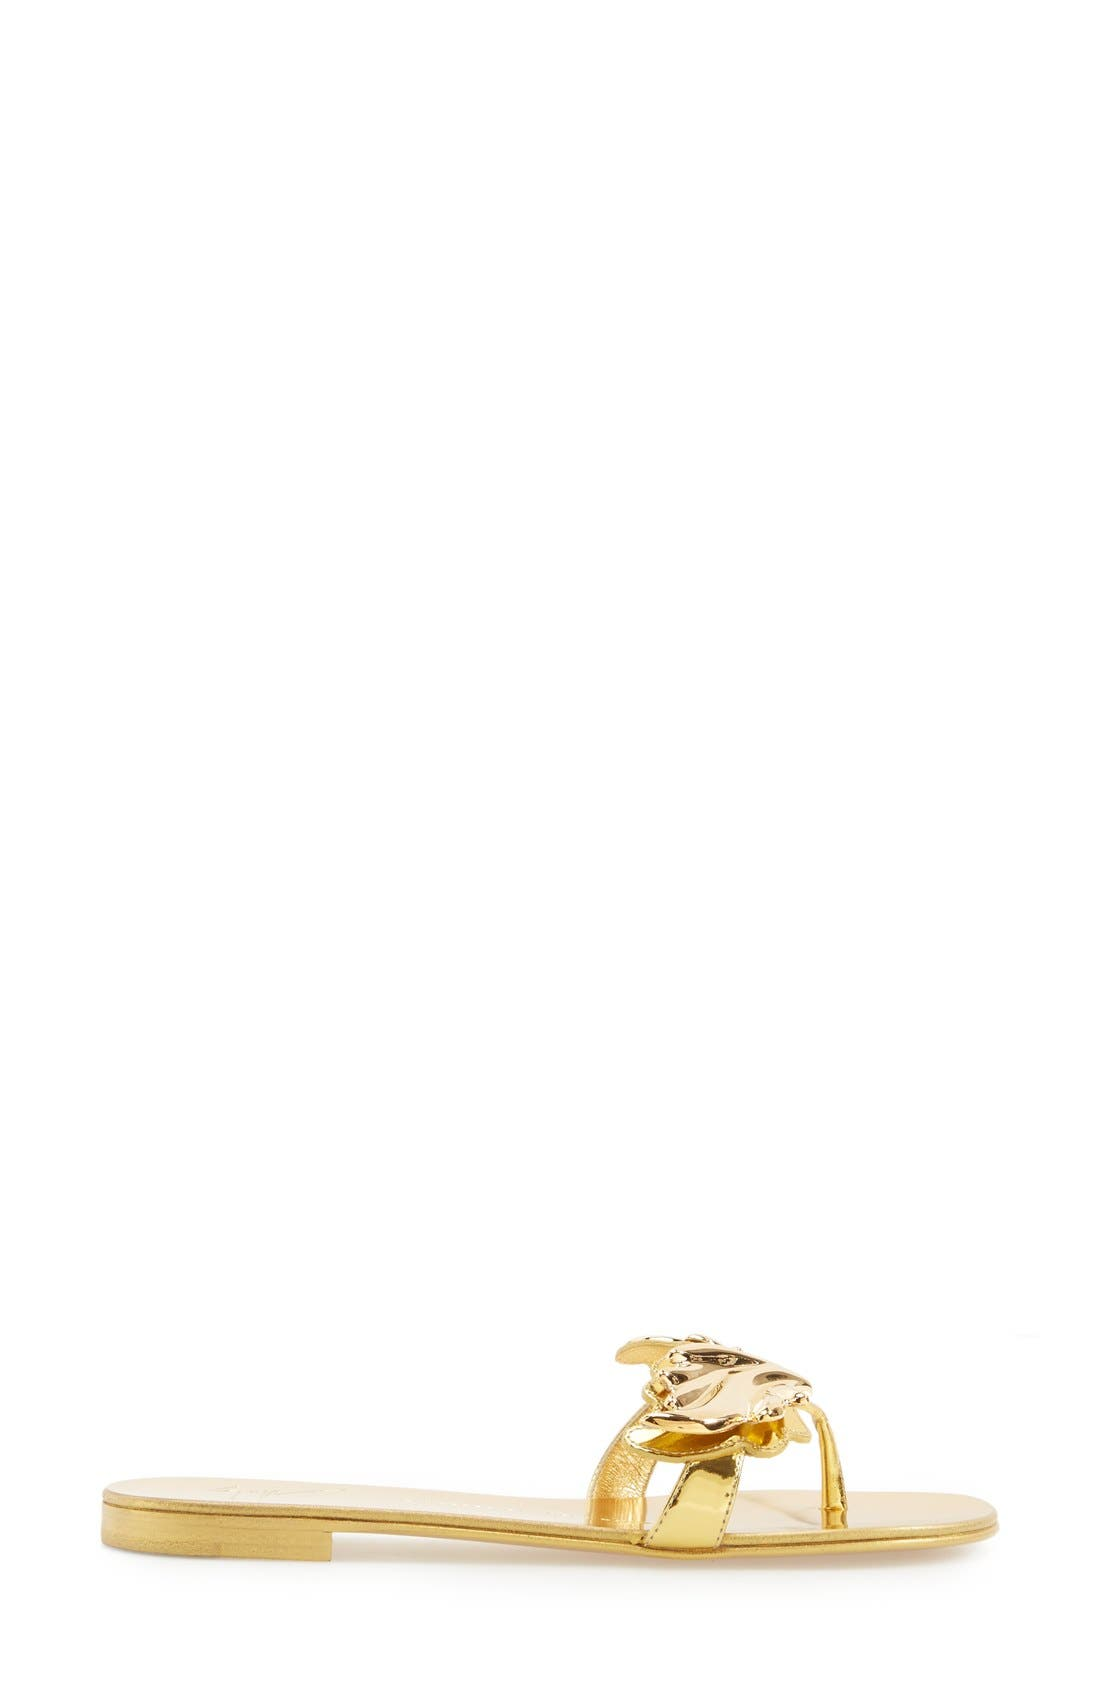 'Coline' Sandal,                             Alternate thumbnail 4, color,                             711